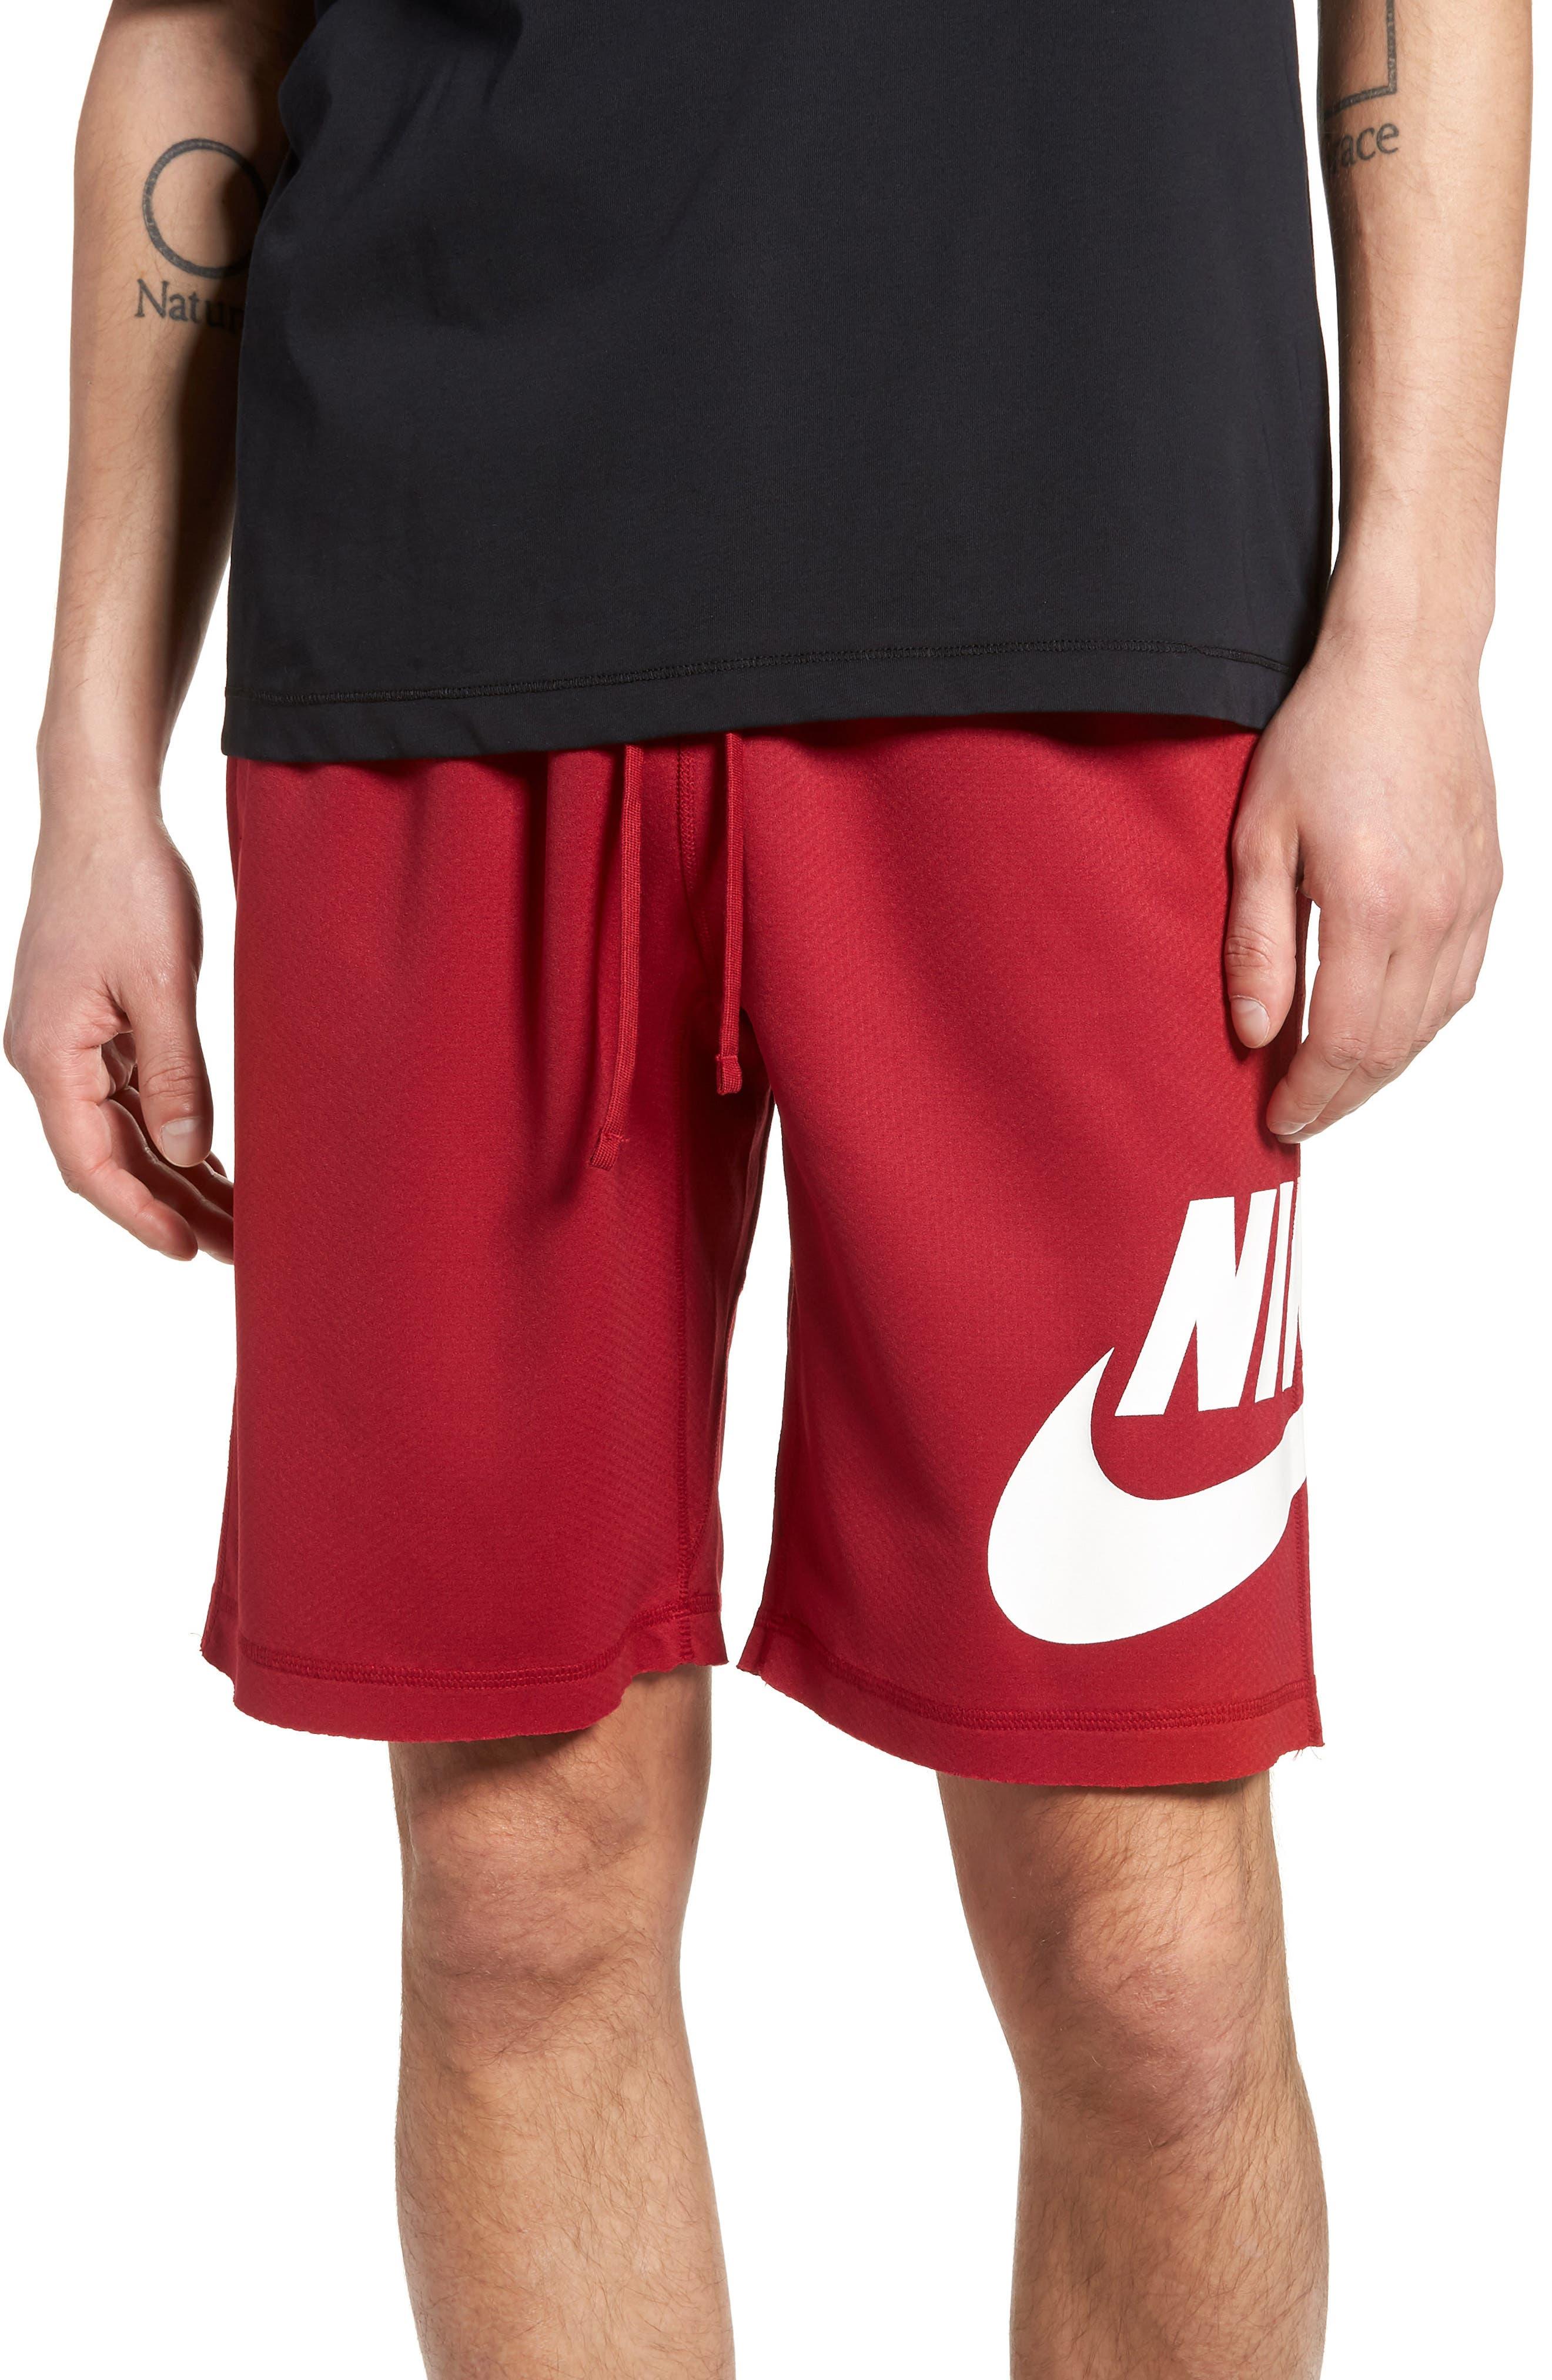 Nordstrom Shorts Nike Men's Sb Men's Nike Nordstrom Nike Men's Sb Sb Shorts Nordstrom Shorts tnqtvazI